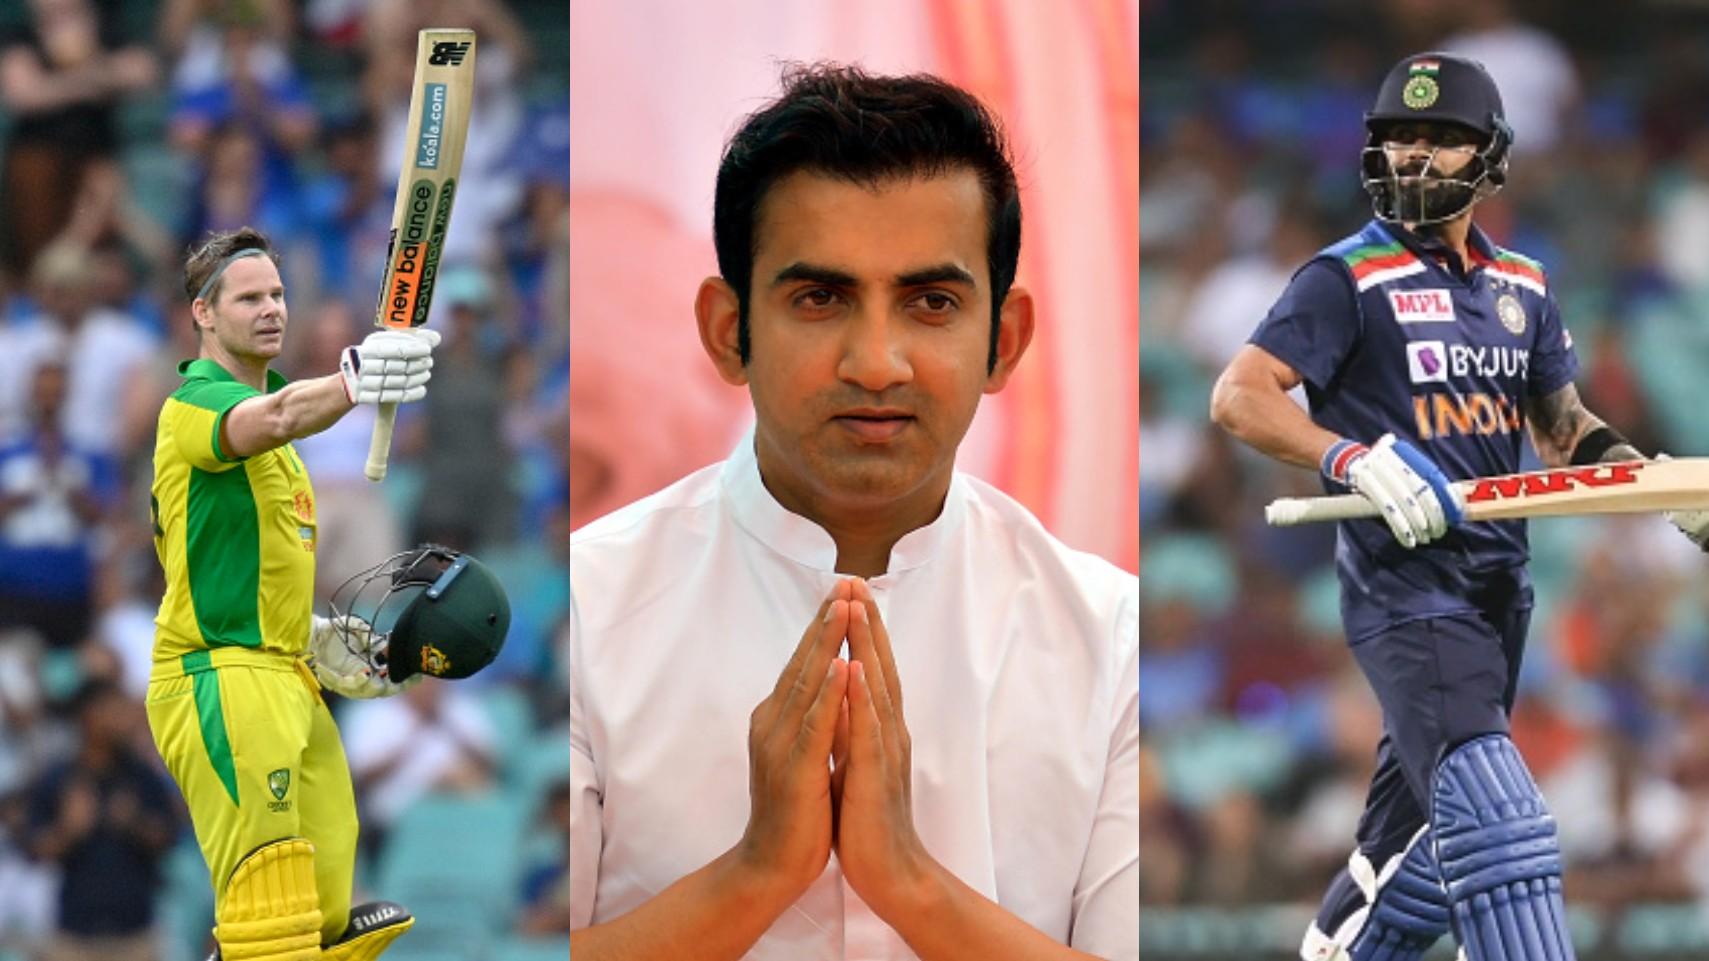 "AUS v IND 2020-21: ""Steve Smith not far away from Virat Kohli,"" Gambhir warns Indians of his ominous form"